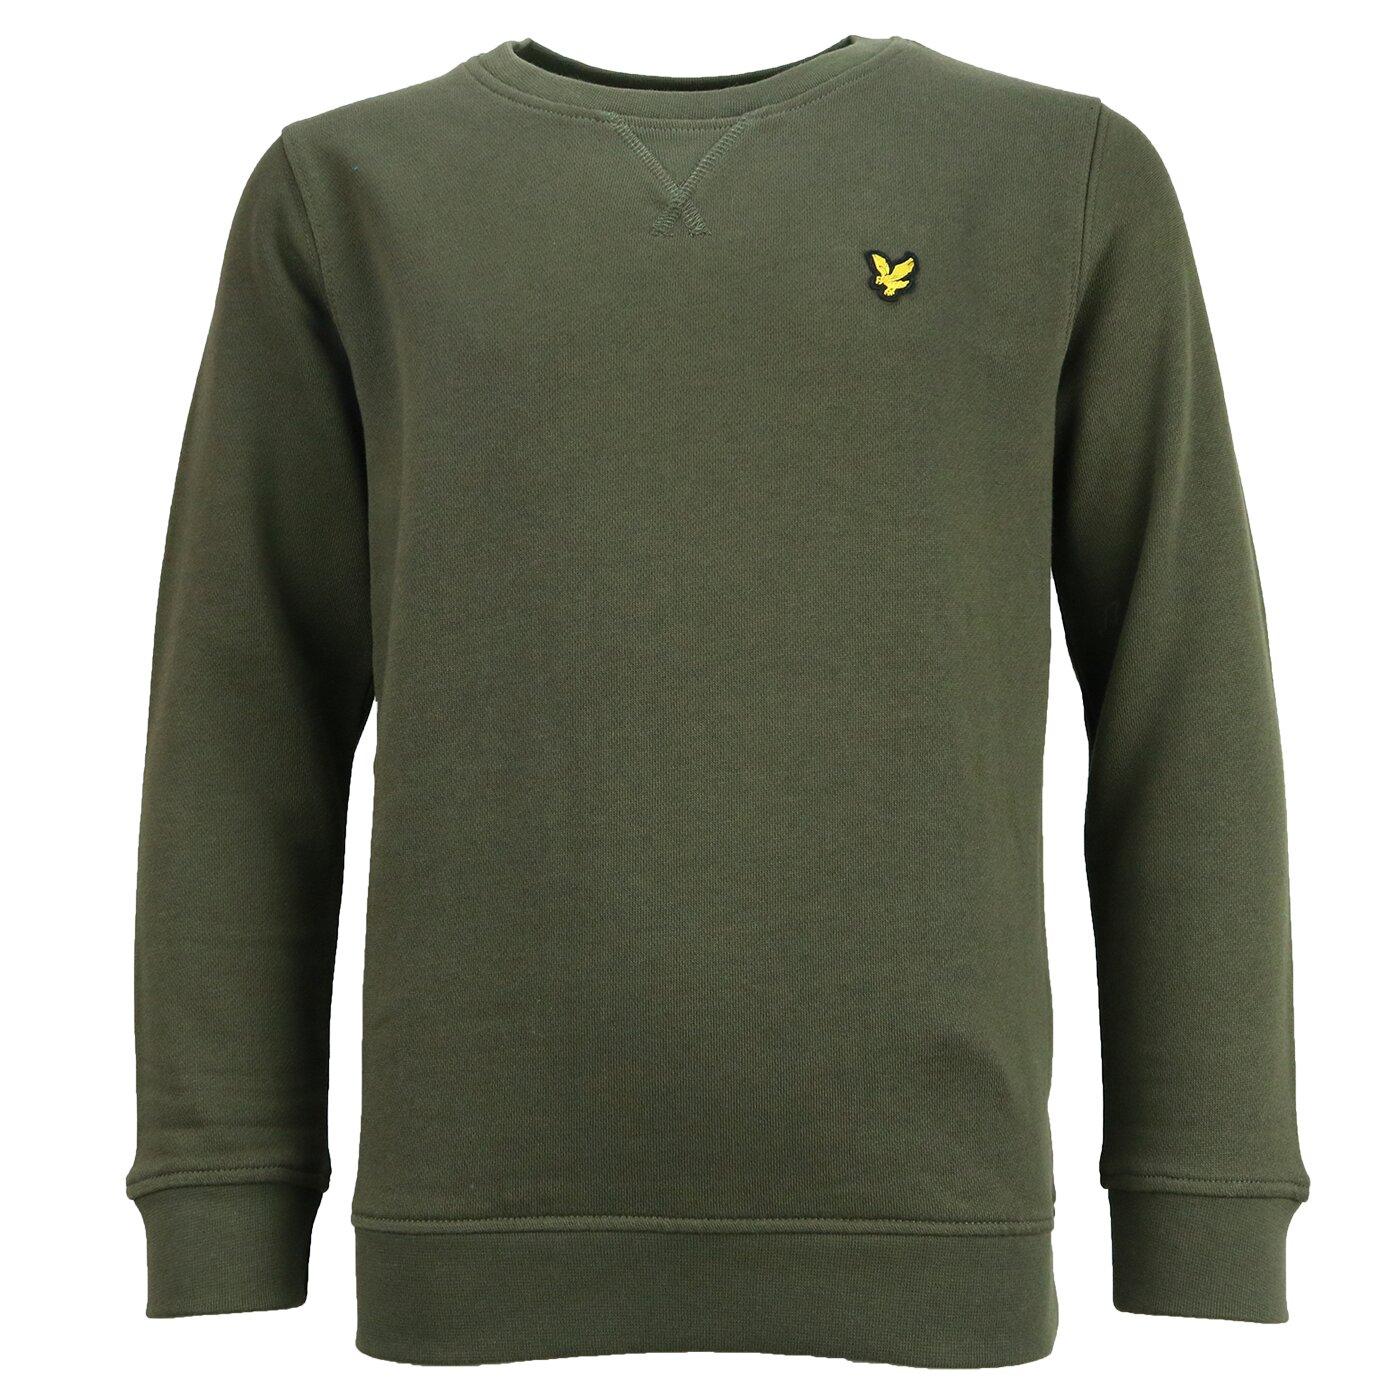 Lyle & Scott sweater grape leaf LSC016